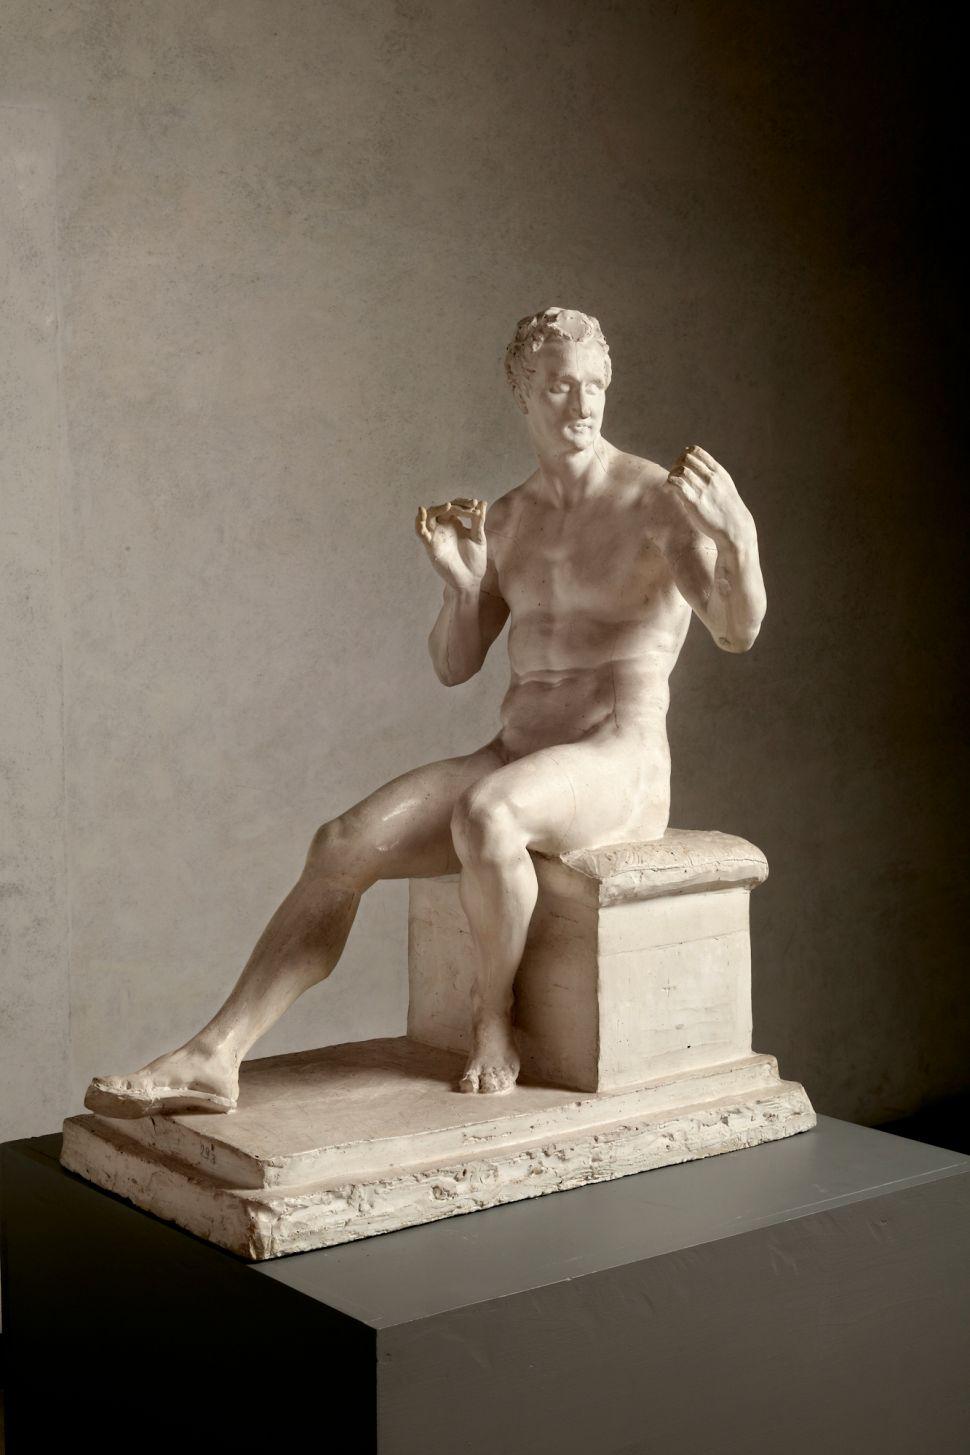 Thomas Jefferson Had an Italian Artist Make These Odd George Washington Sculptures